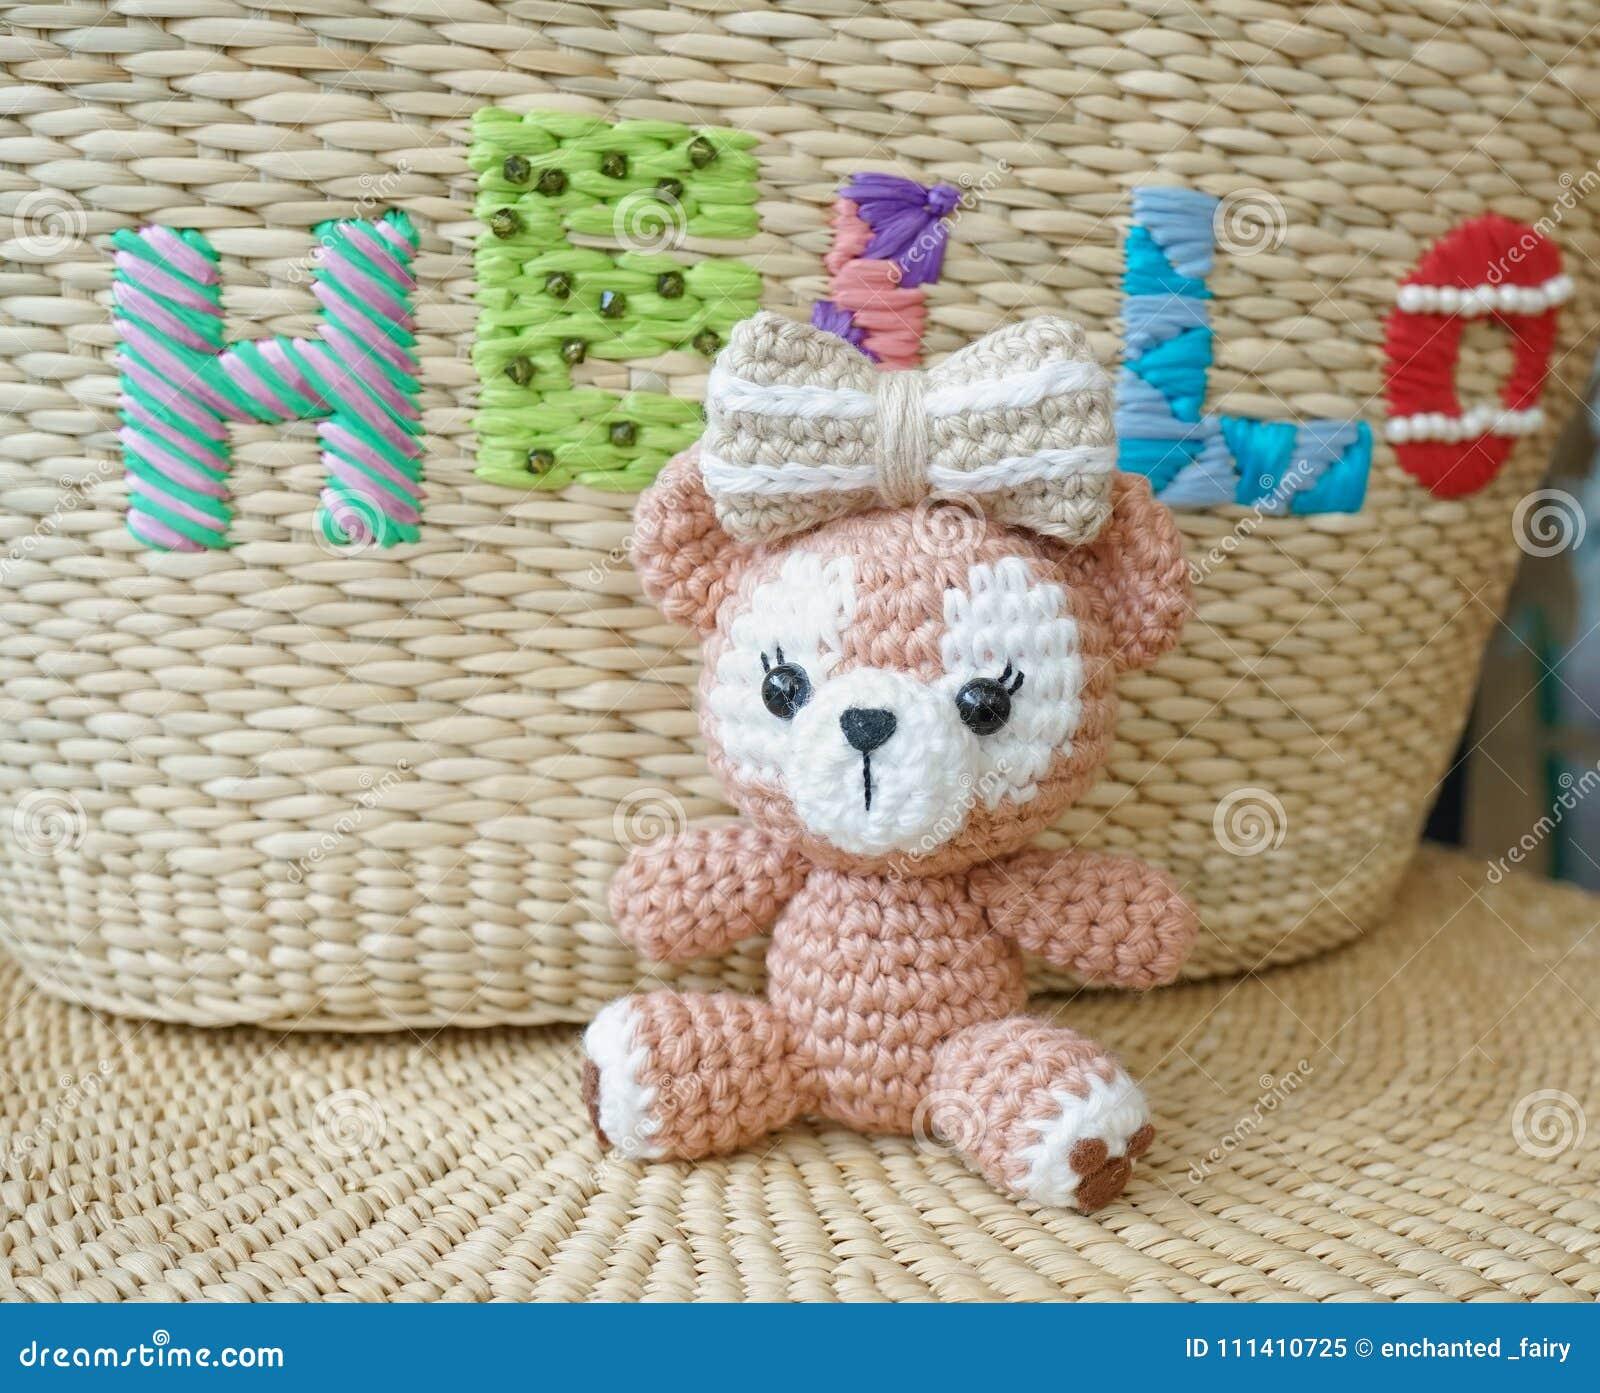 Urso Friends amigurumi-crochê no Elo7 | Abelhinha Crocheteira (9DB654) | 1149x1300